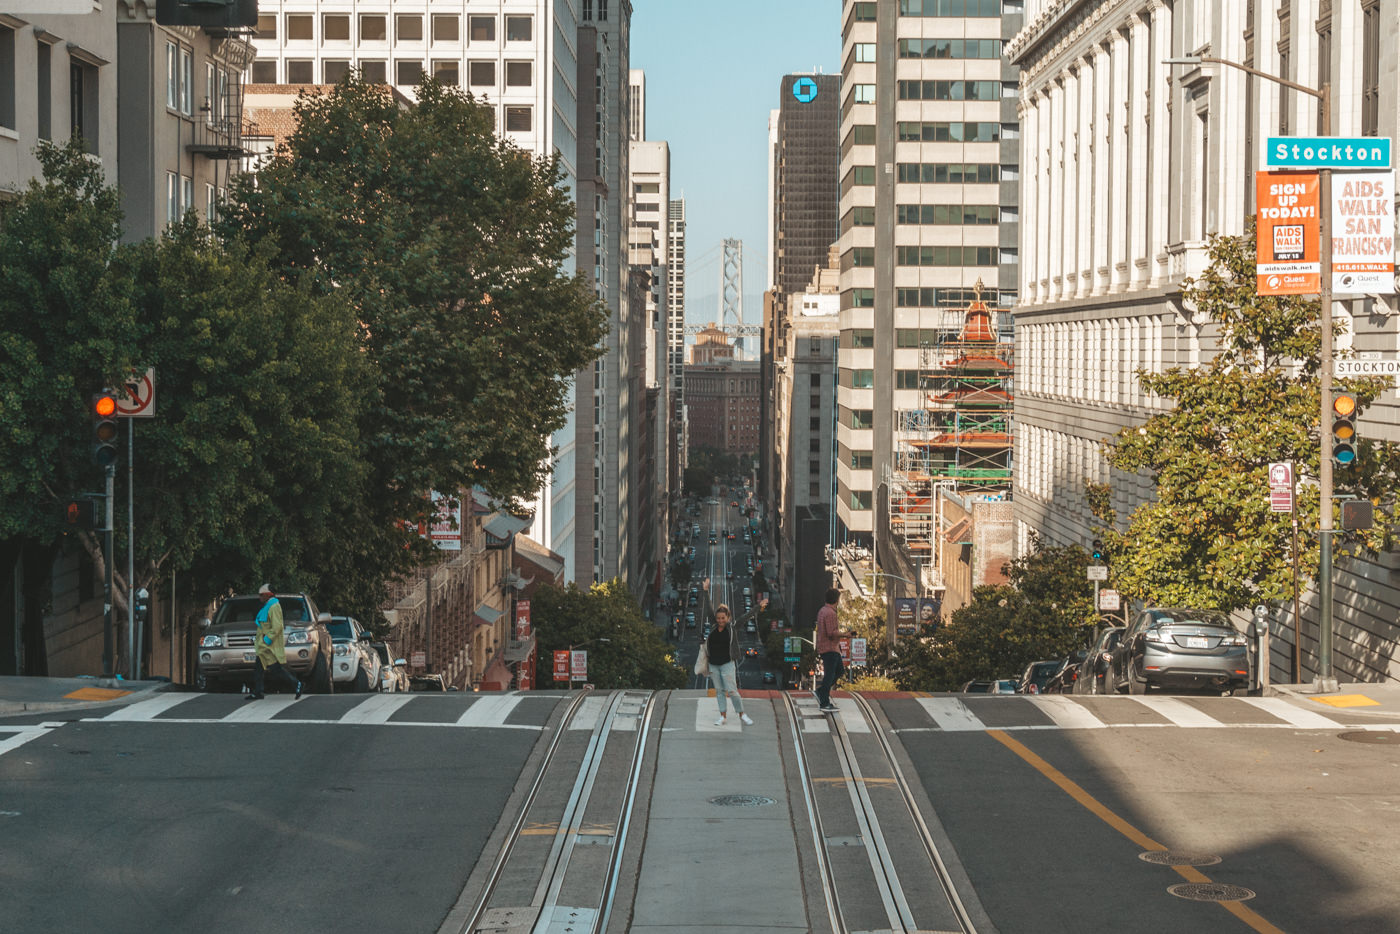 Julia in San Francisco